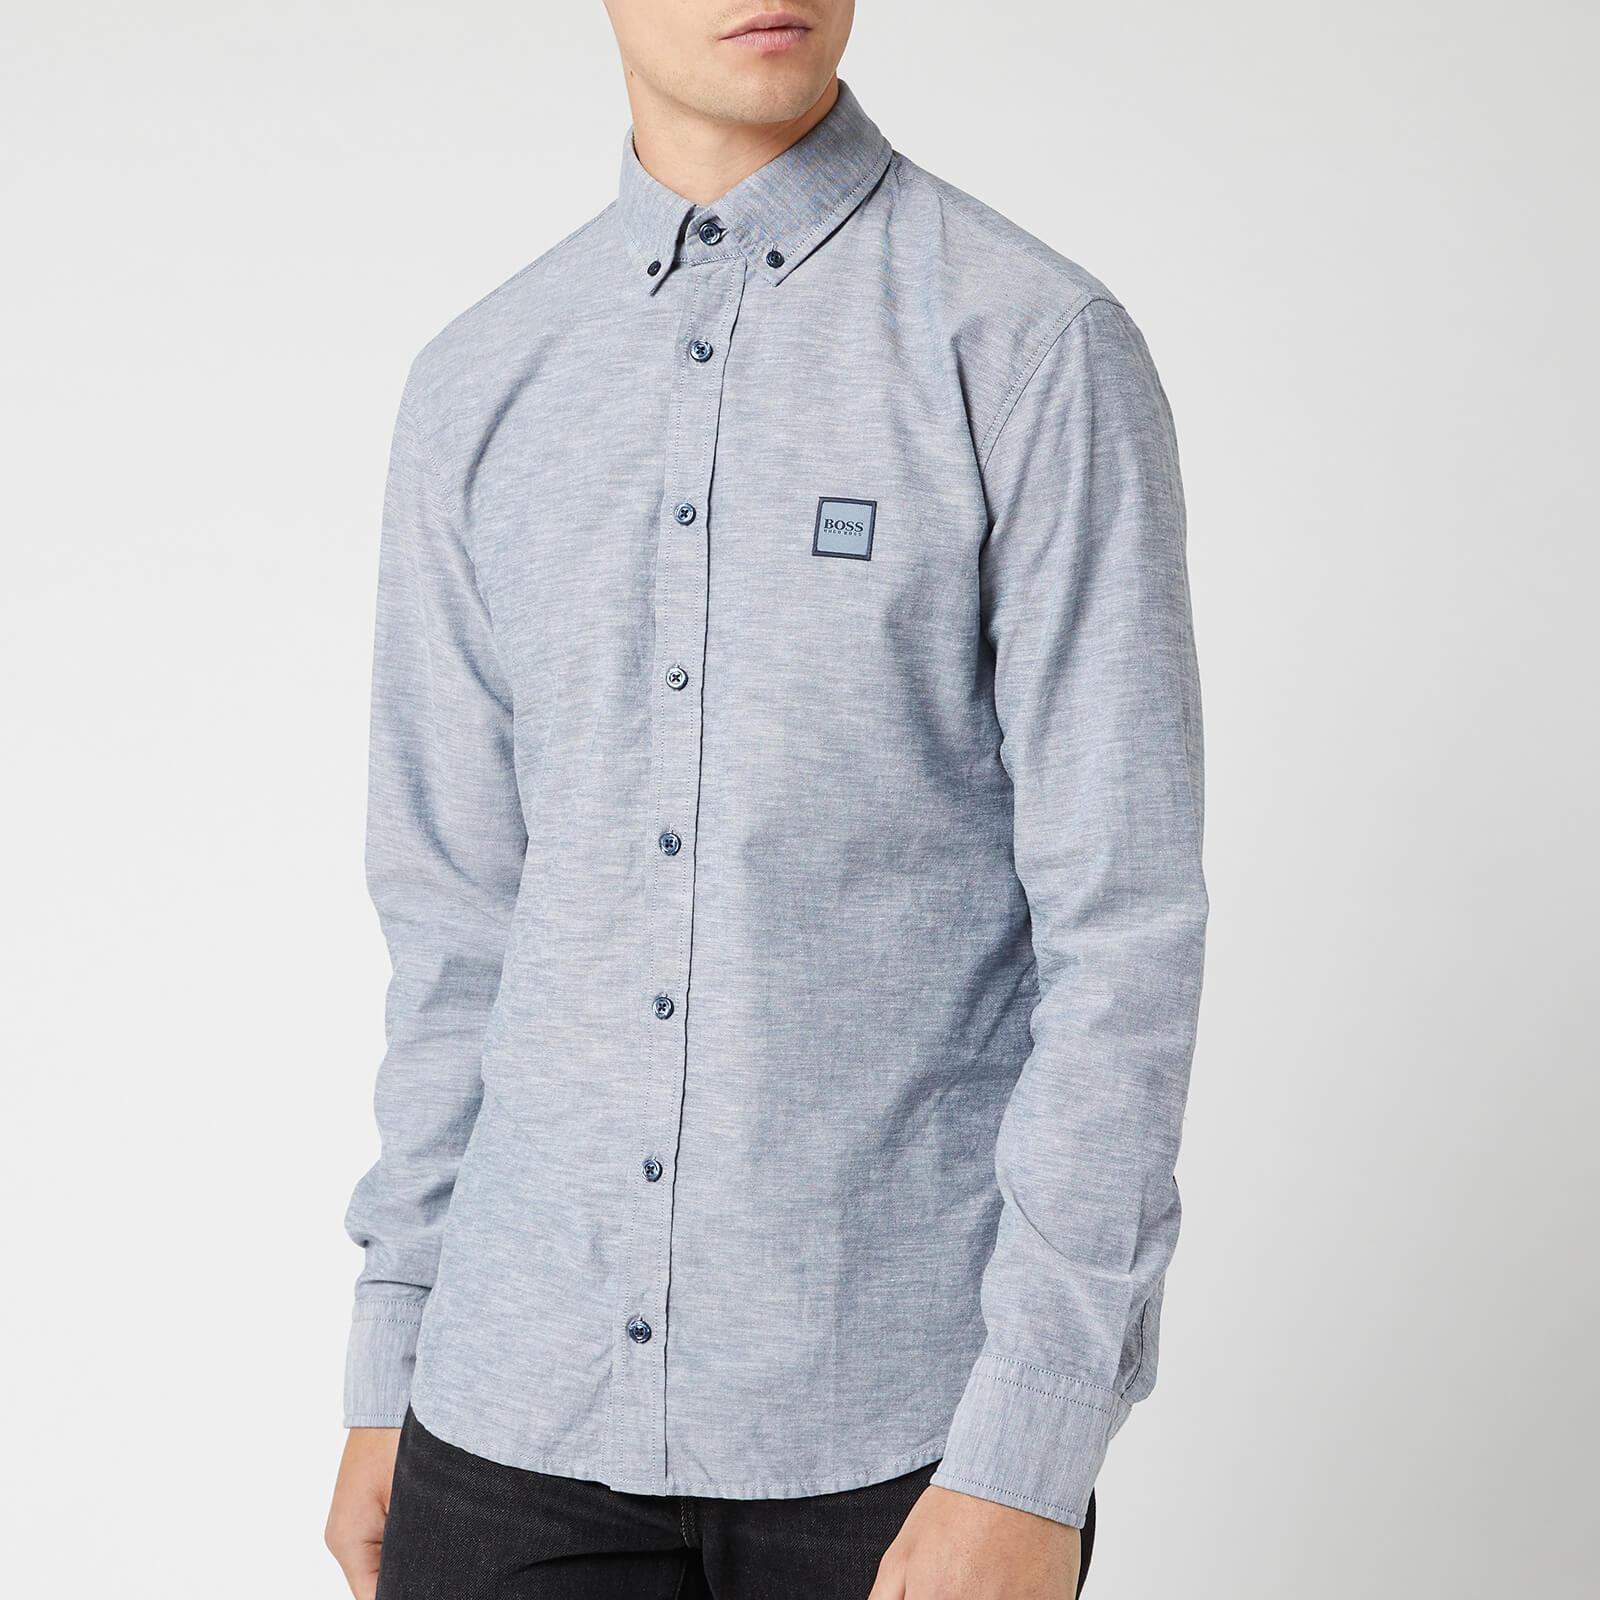 5cbbdb7c0 BOSS Men's Mabsoot Long Sleeved Shirt - Dark Blue Mens Clothing ...